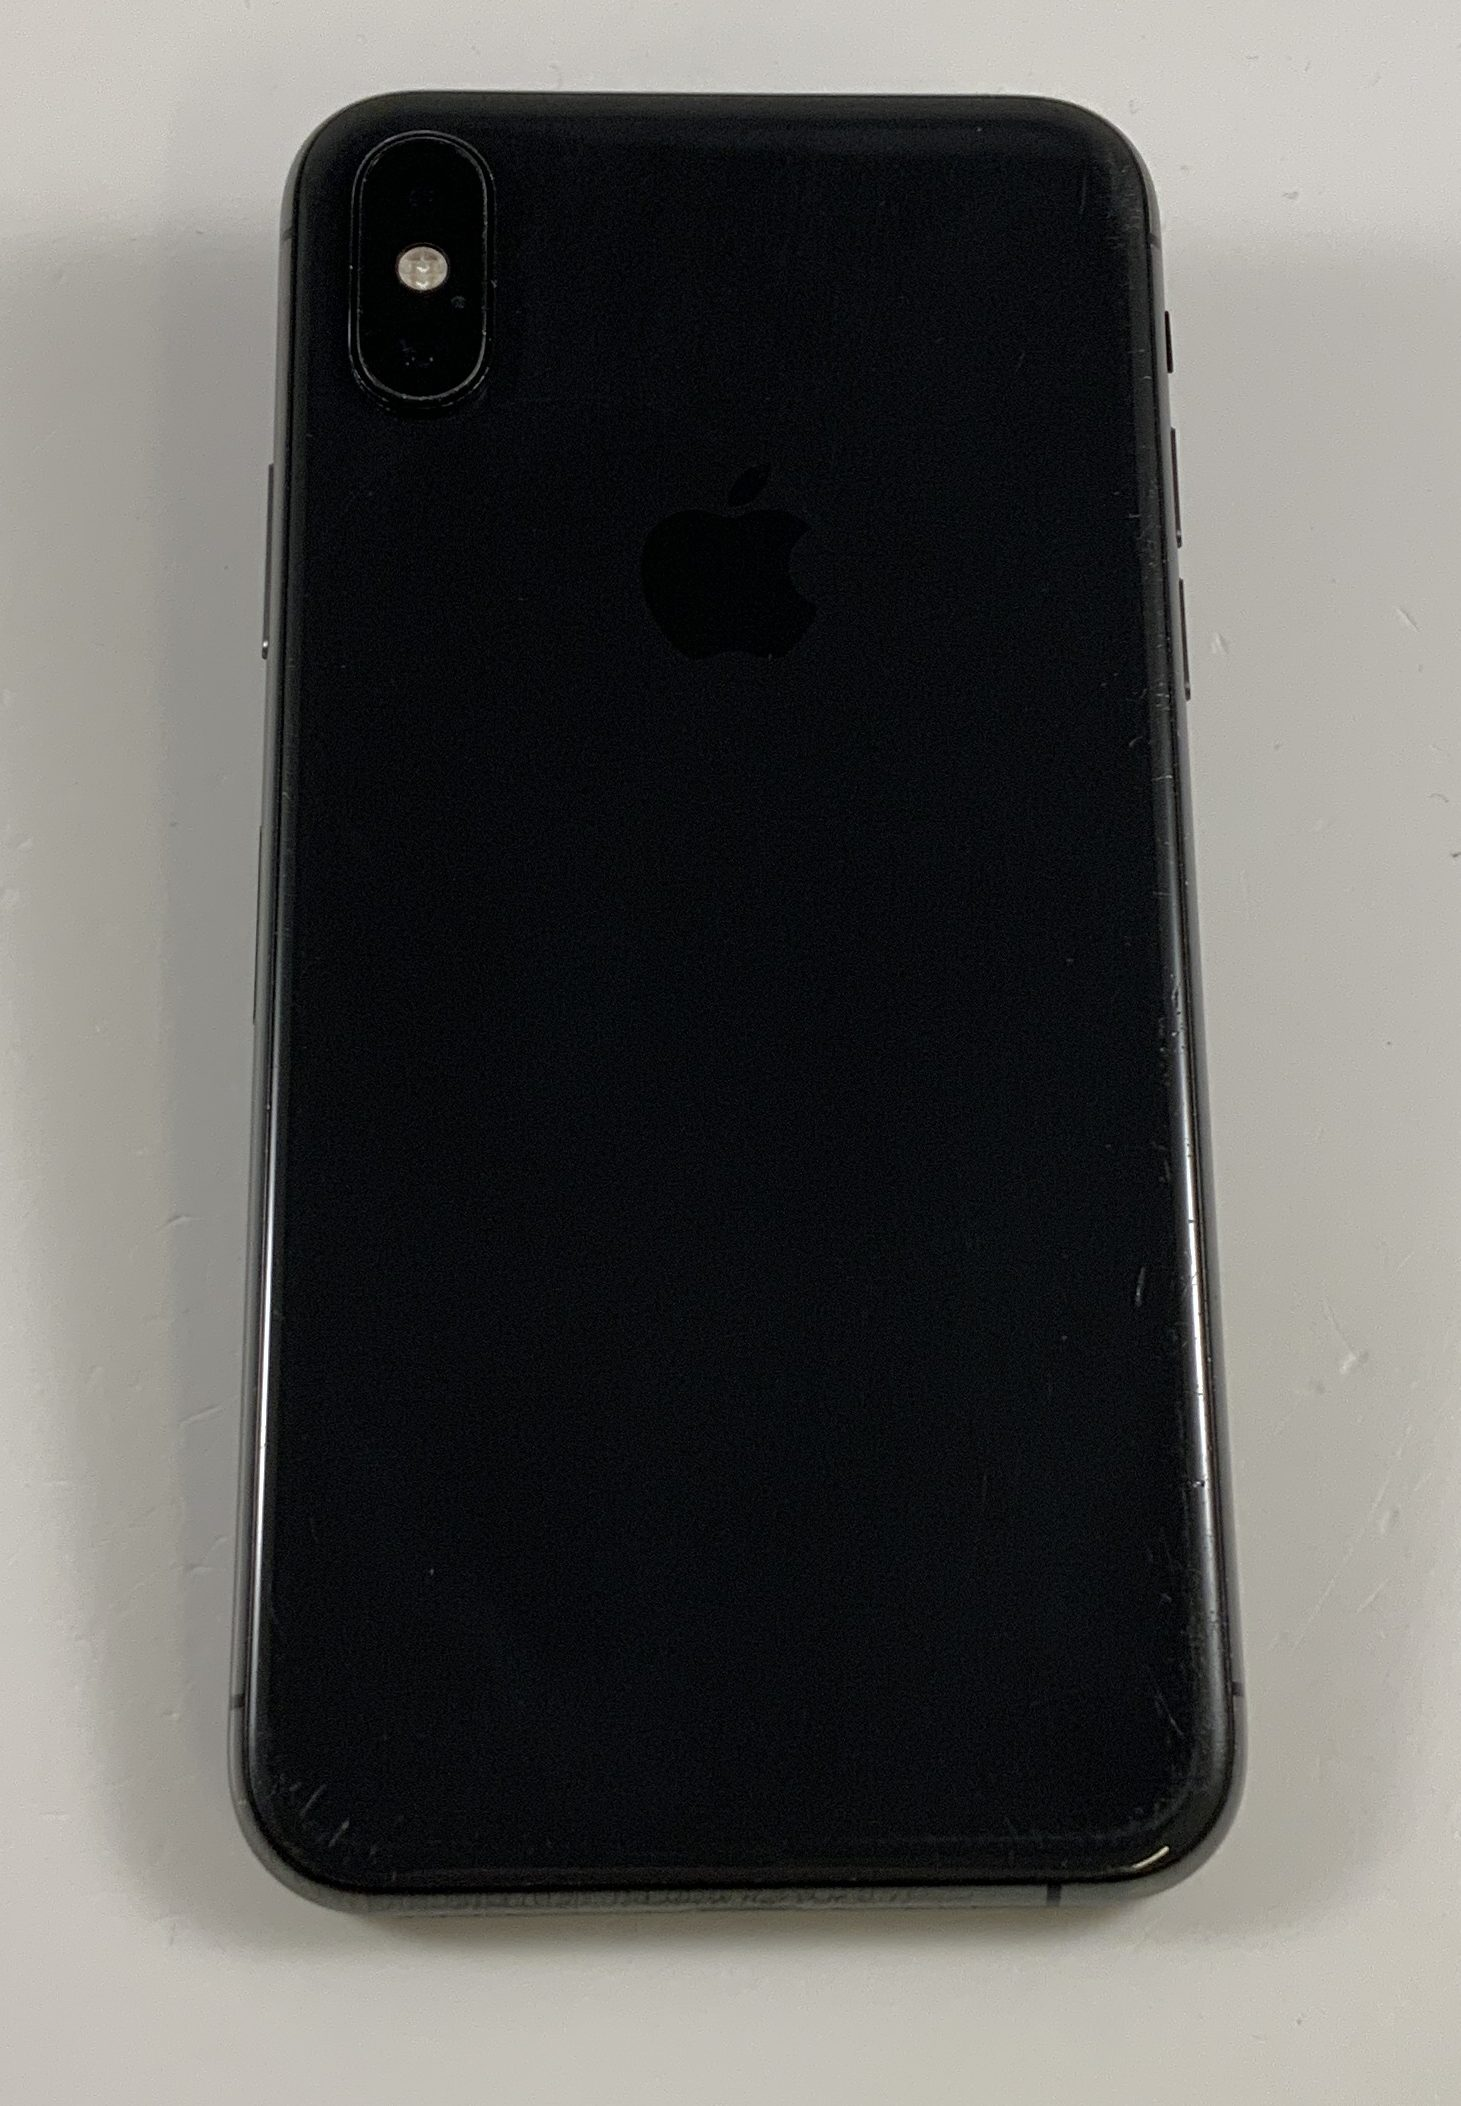 iPhone XS 256GB, 256GB, Space Gray, immagine 2